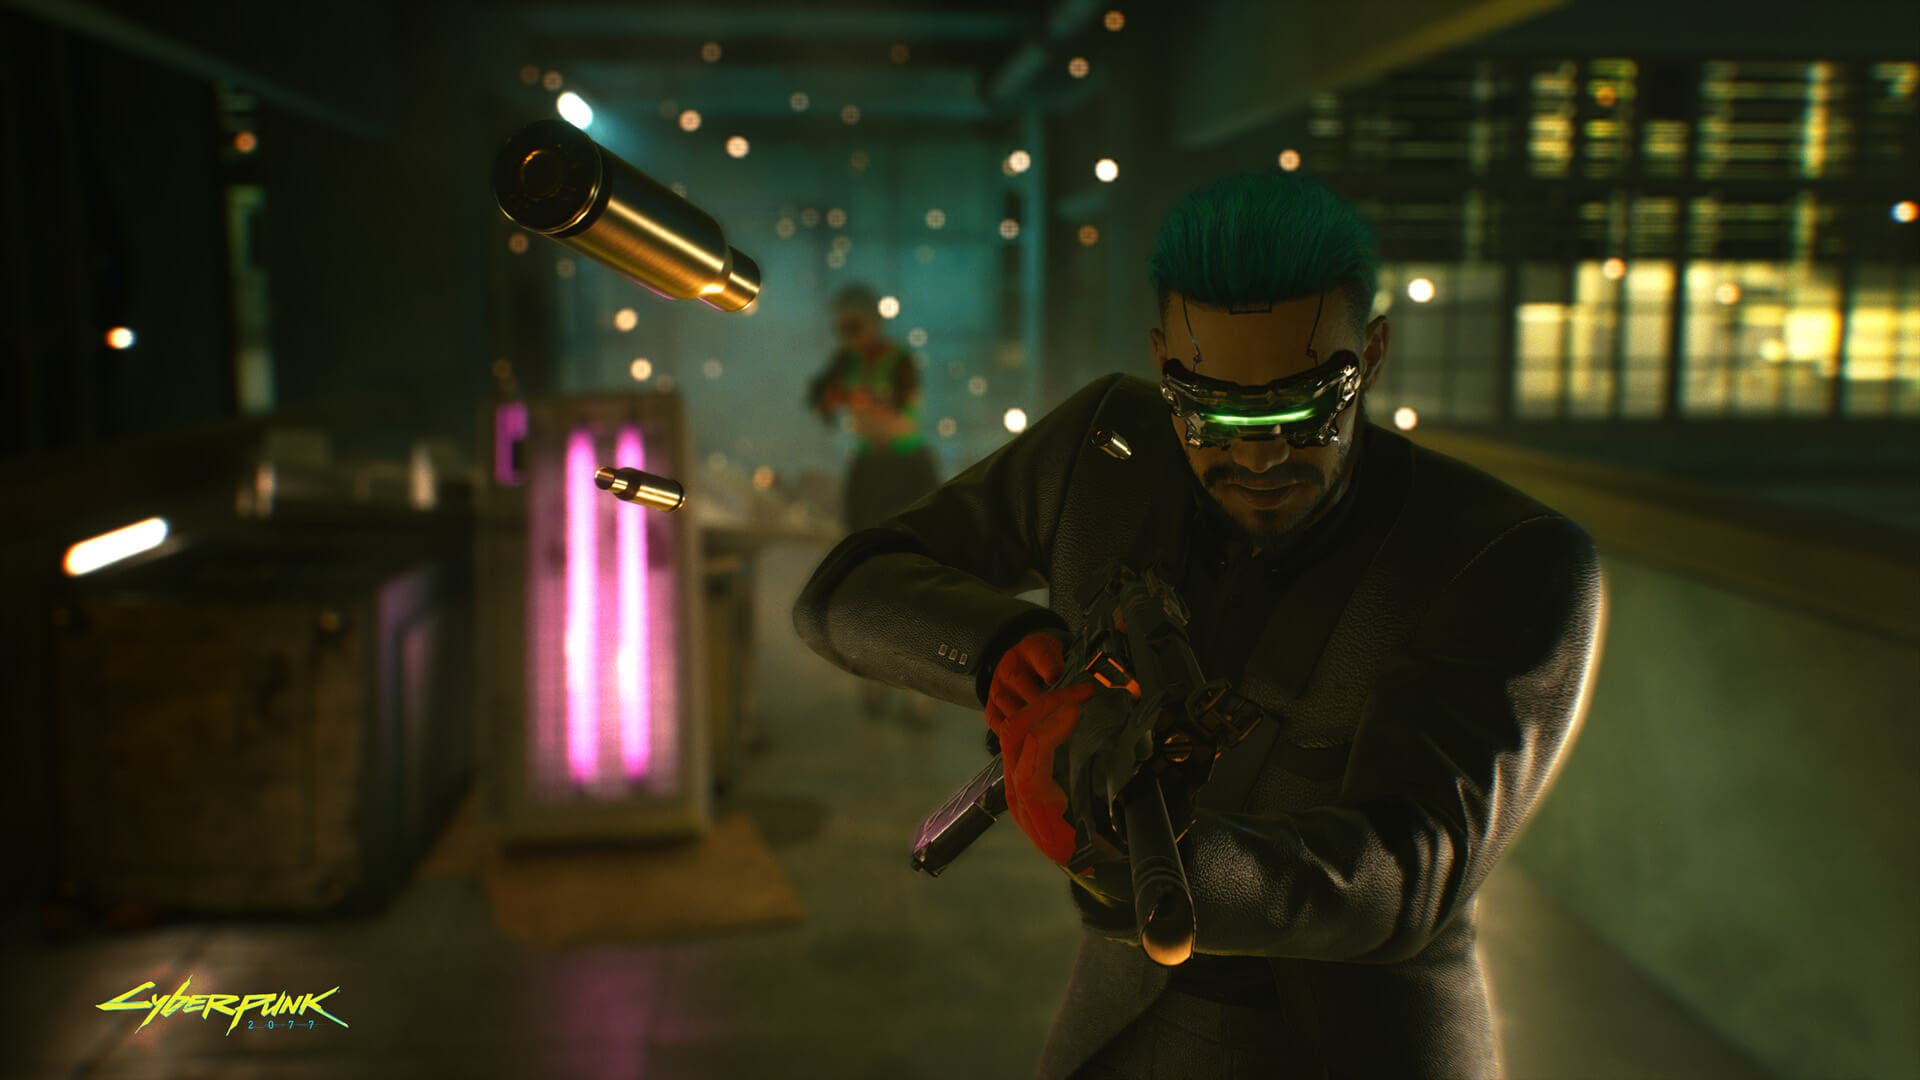 imágenes de Cyberpunk 2077